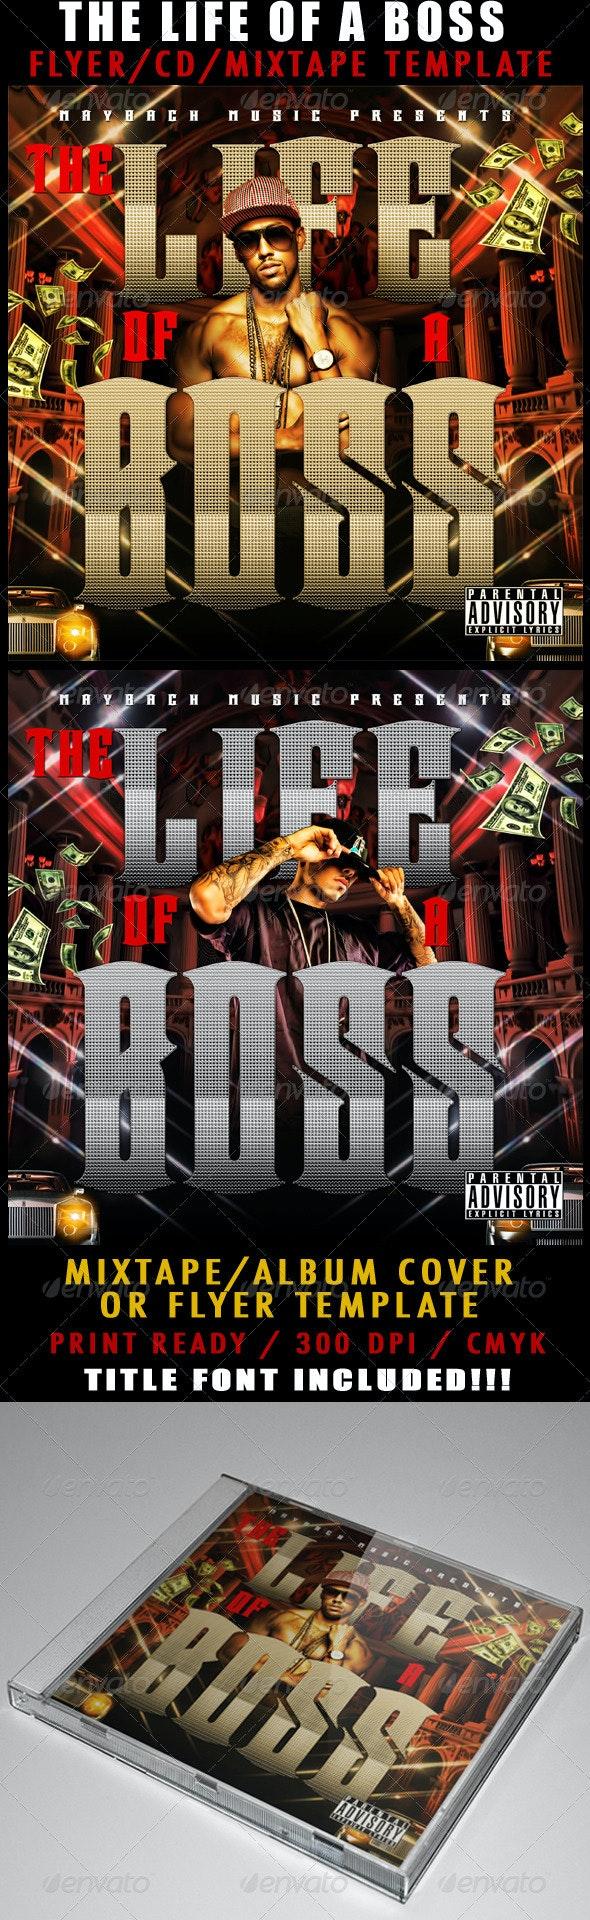 The Life Of A Boss Mixtape / Flyer or CD Template - CD & DVD Artwork Print Templates